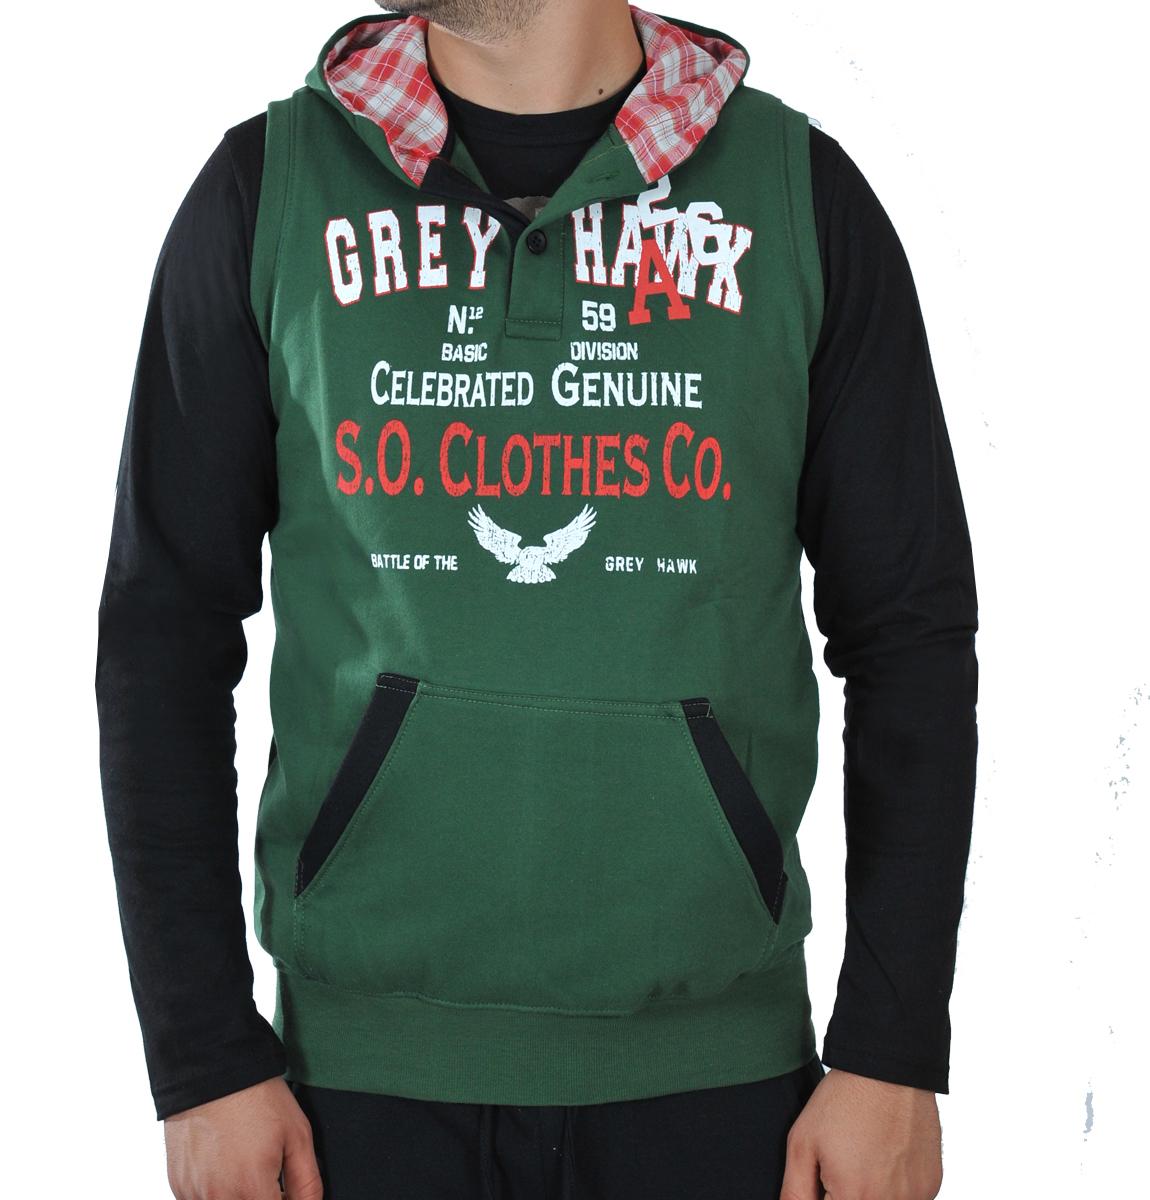 Aμάνικο Φούτερ Grey Hawk-Κυπαρισσί αρχική ανδρικά ρούχα φούτερ